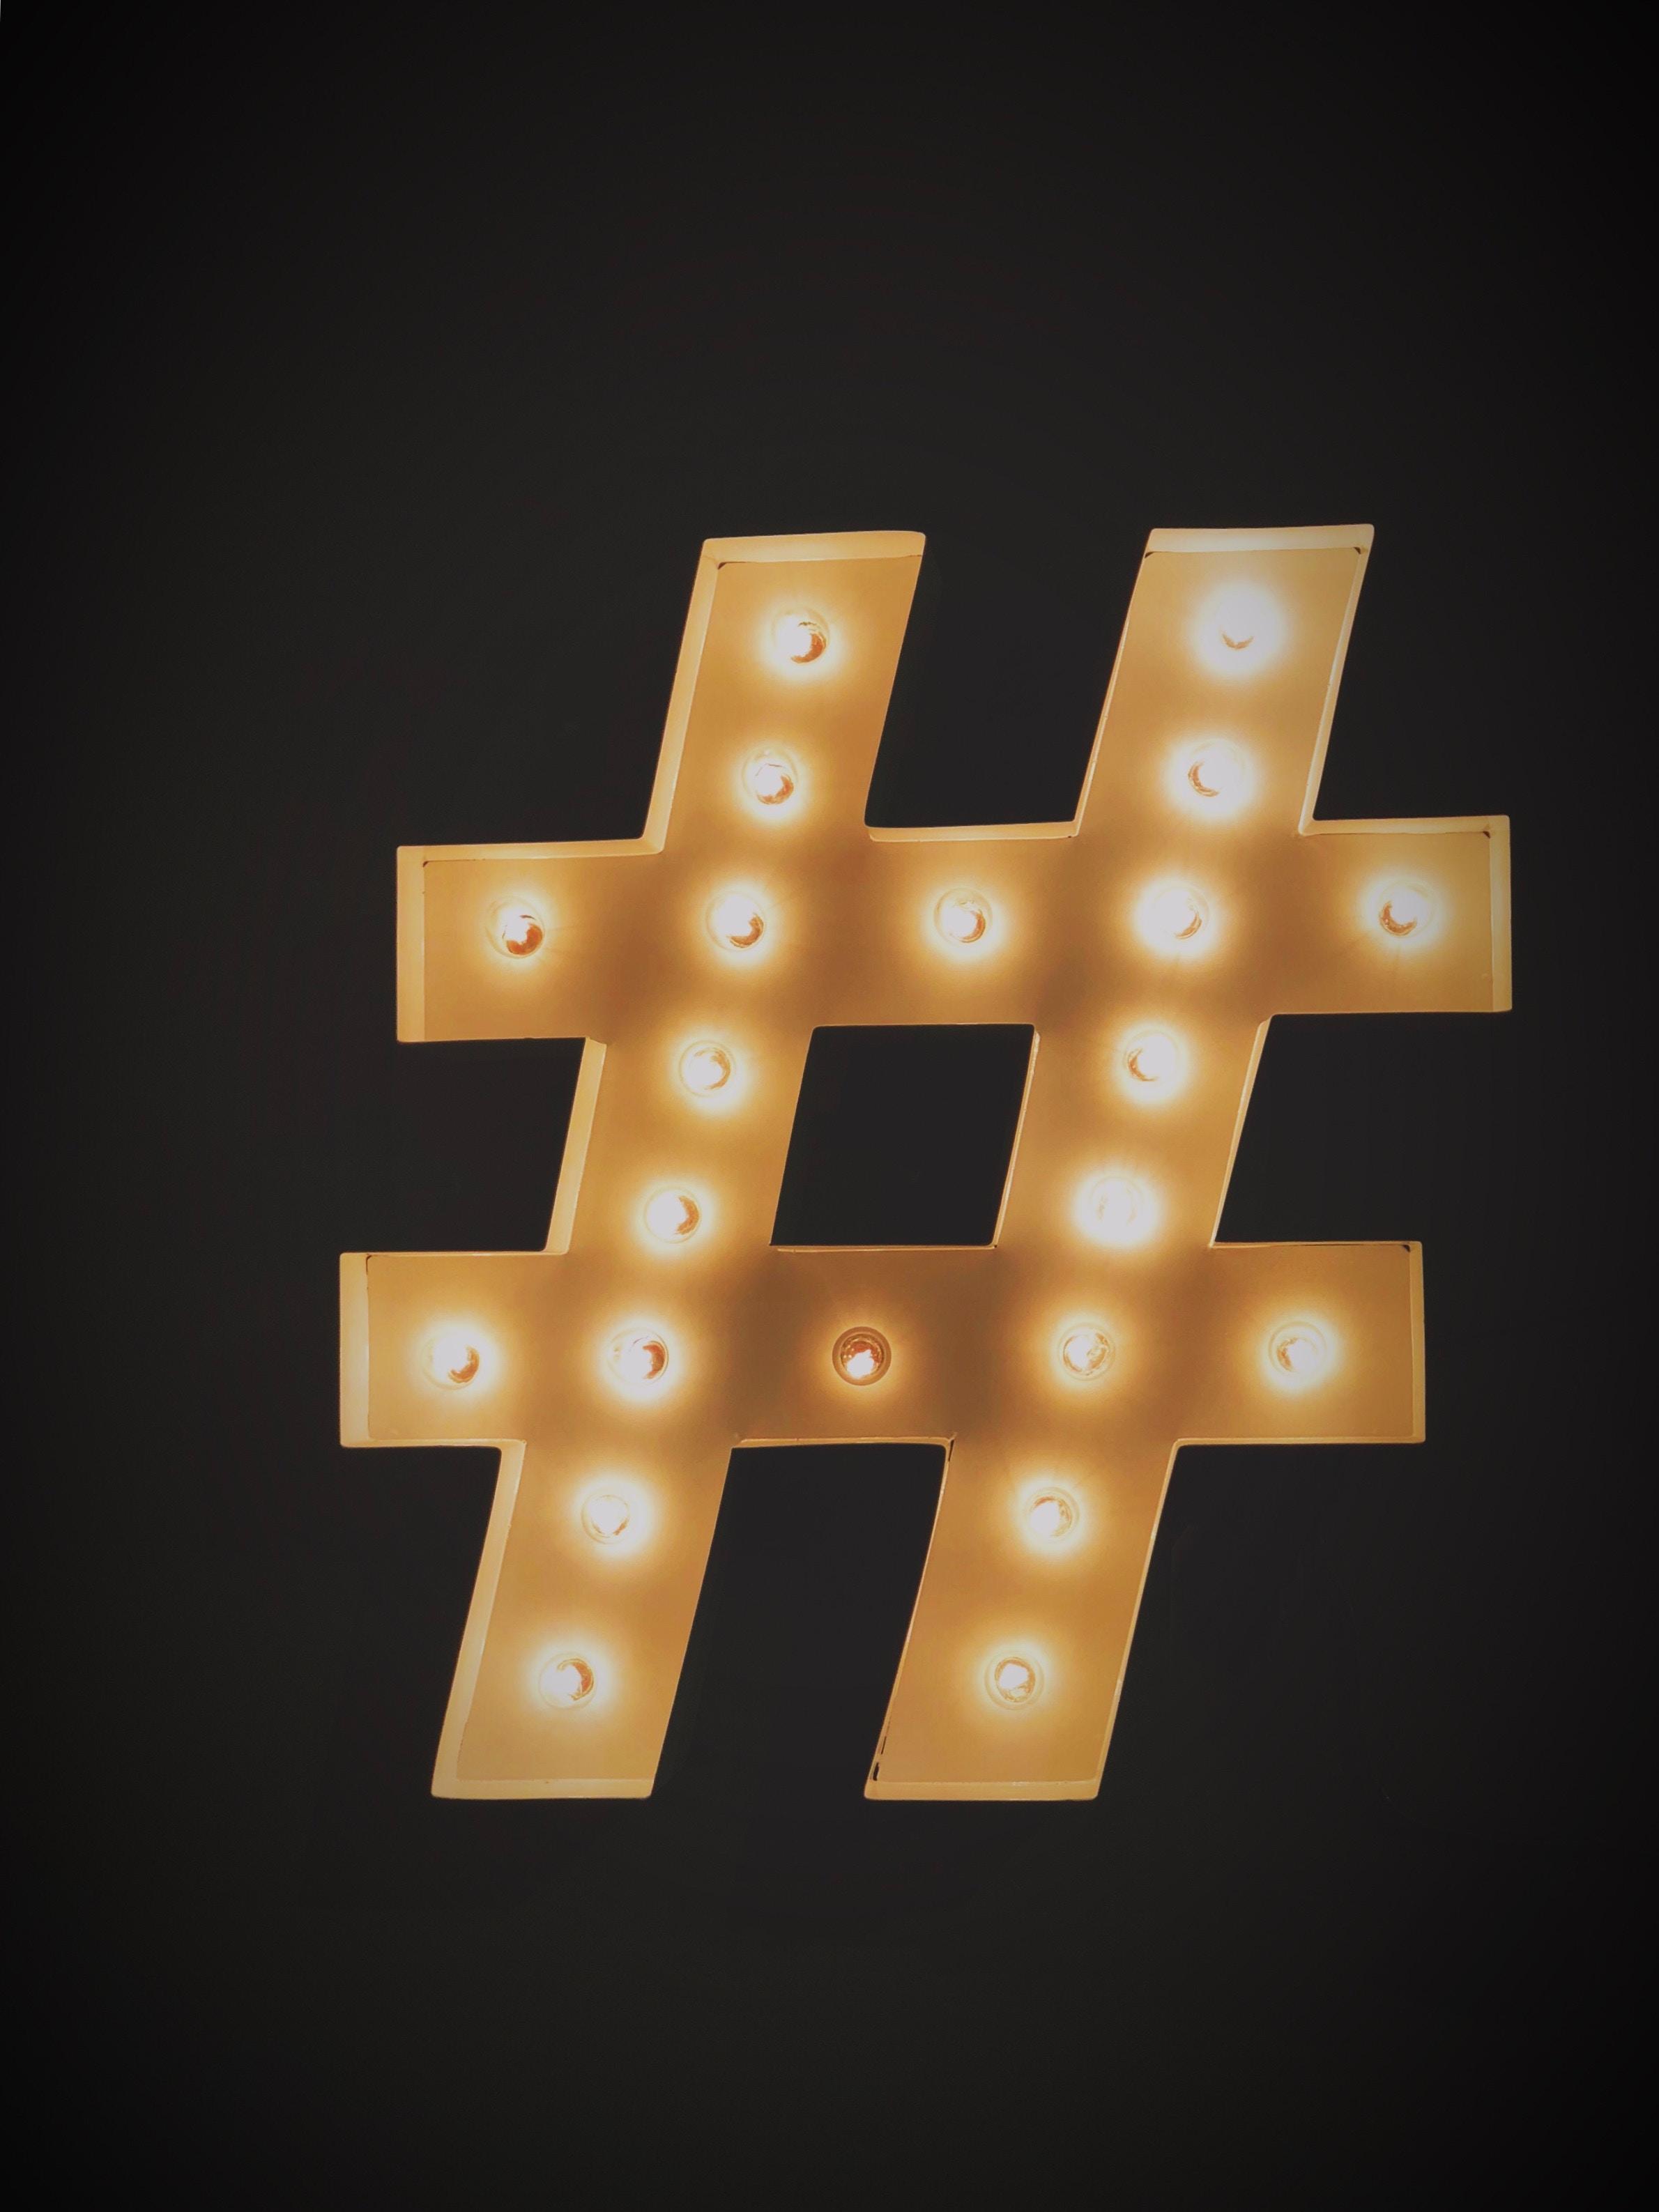 Hashtags oficiales de la JMJ 2019